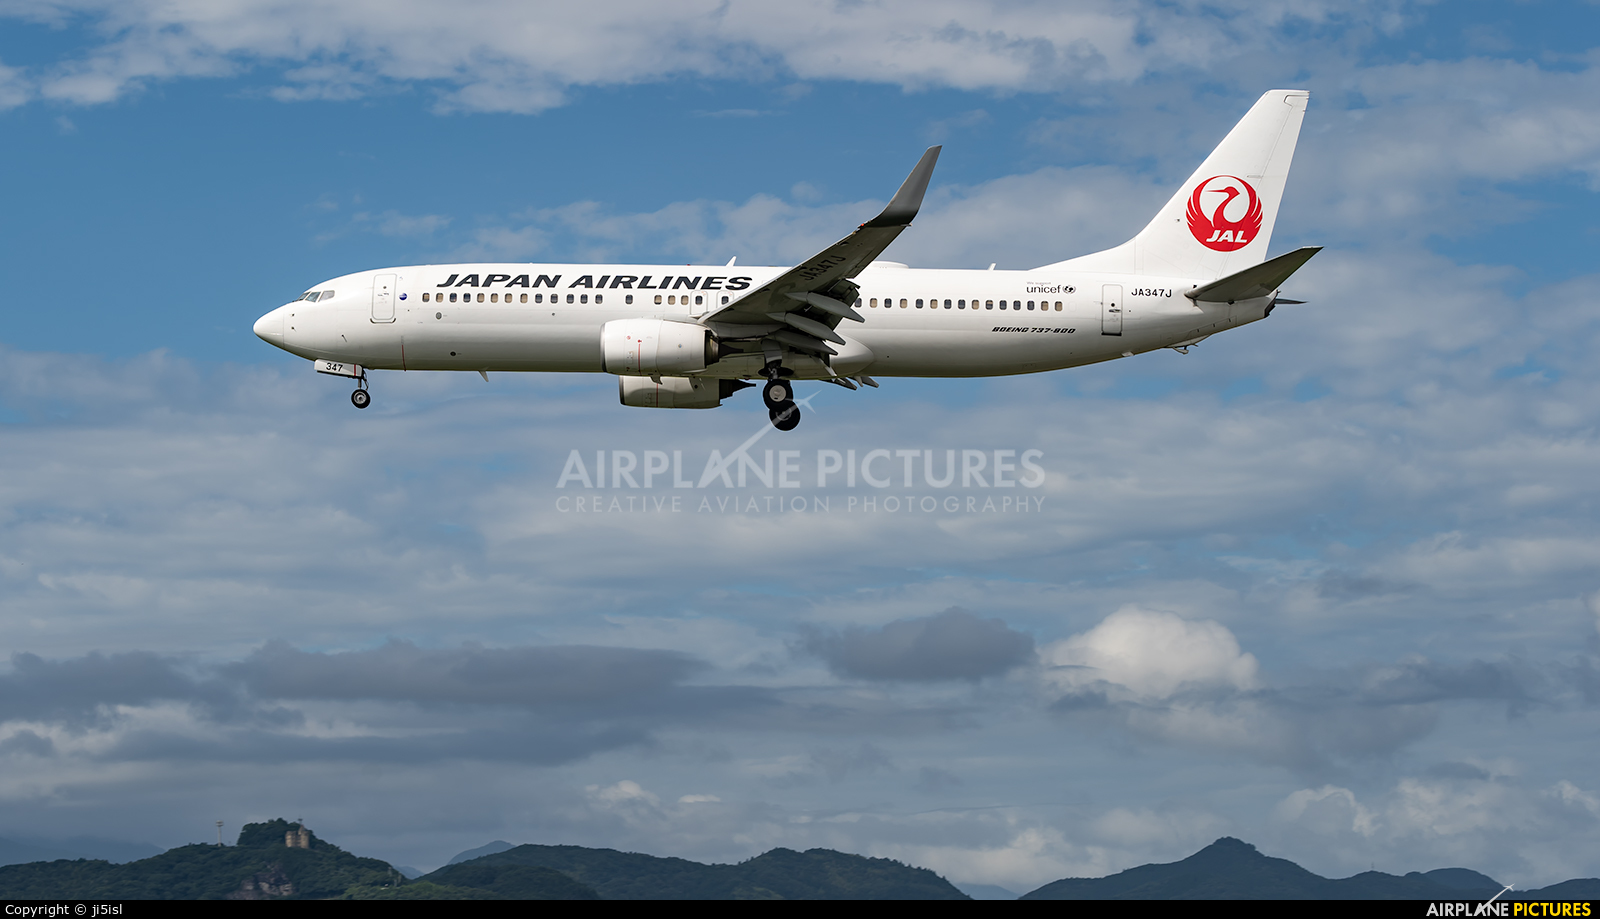 JAL - Japan Airlines JA347J aircraft at Kōchi